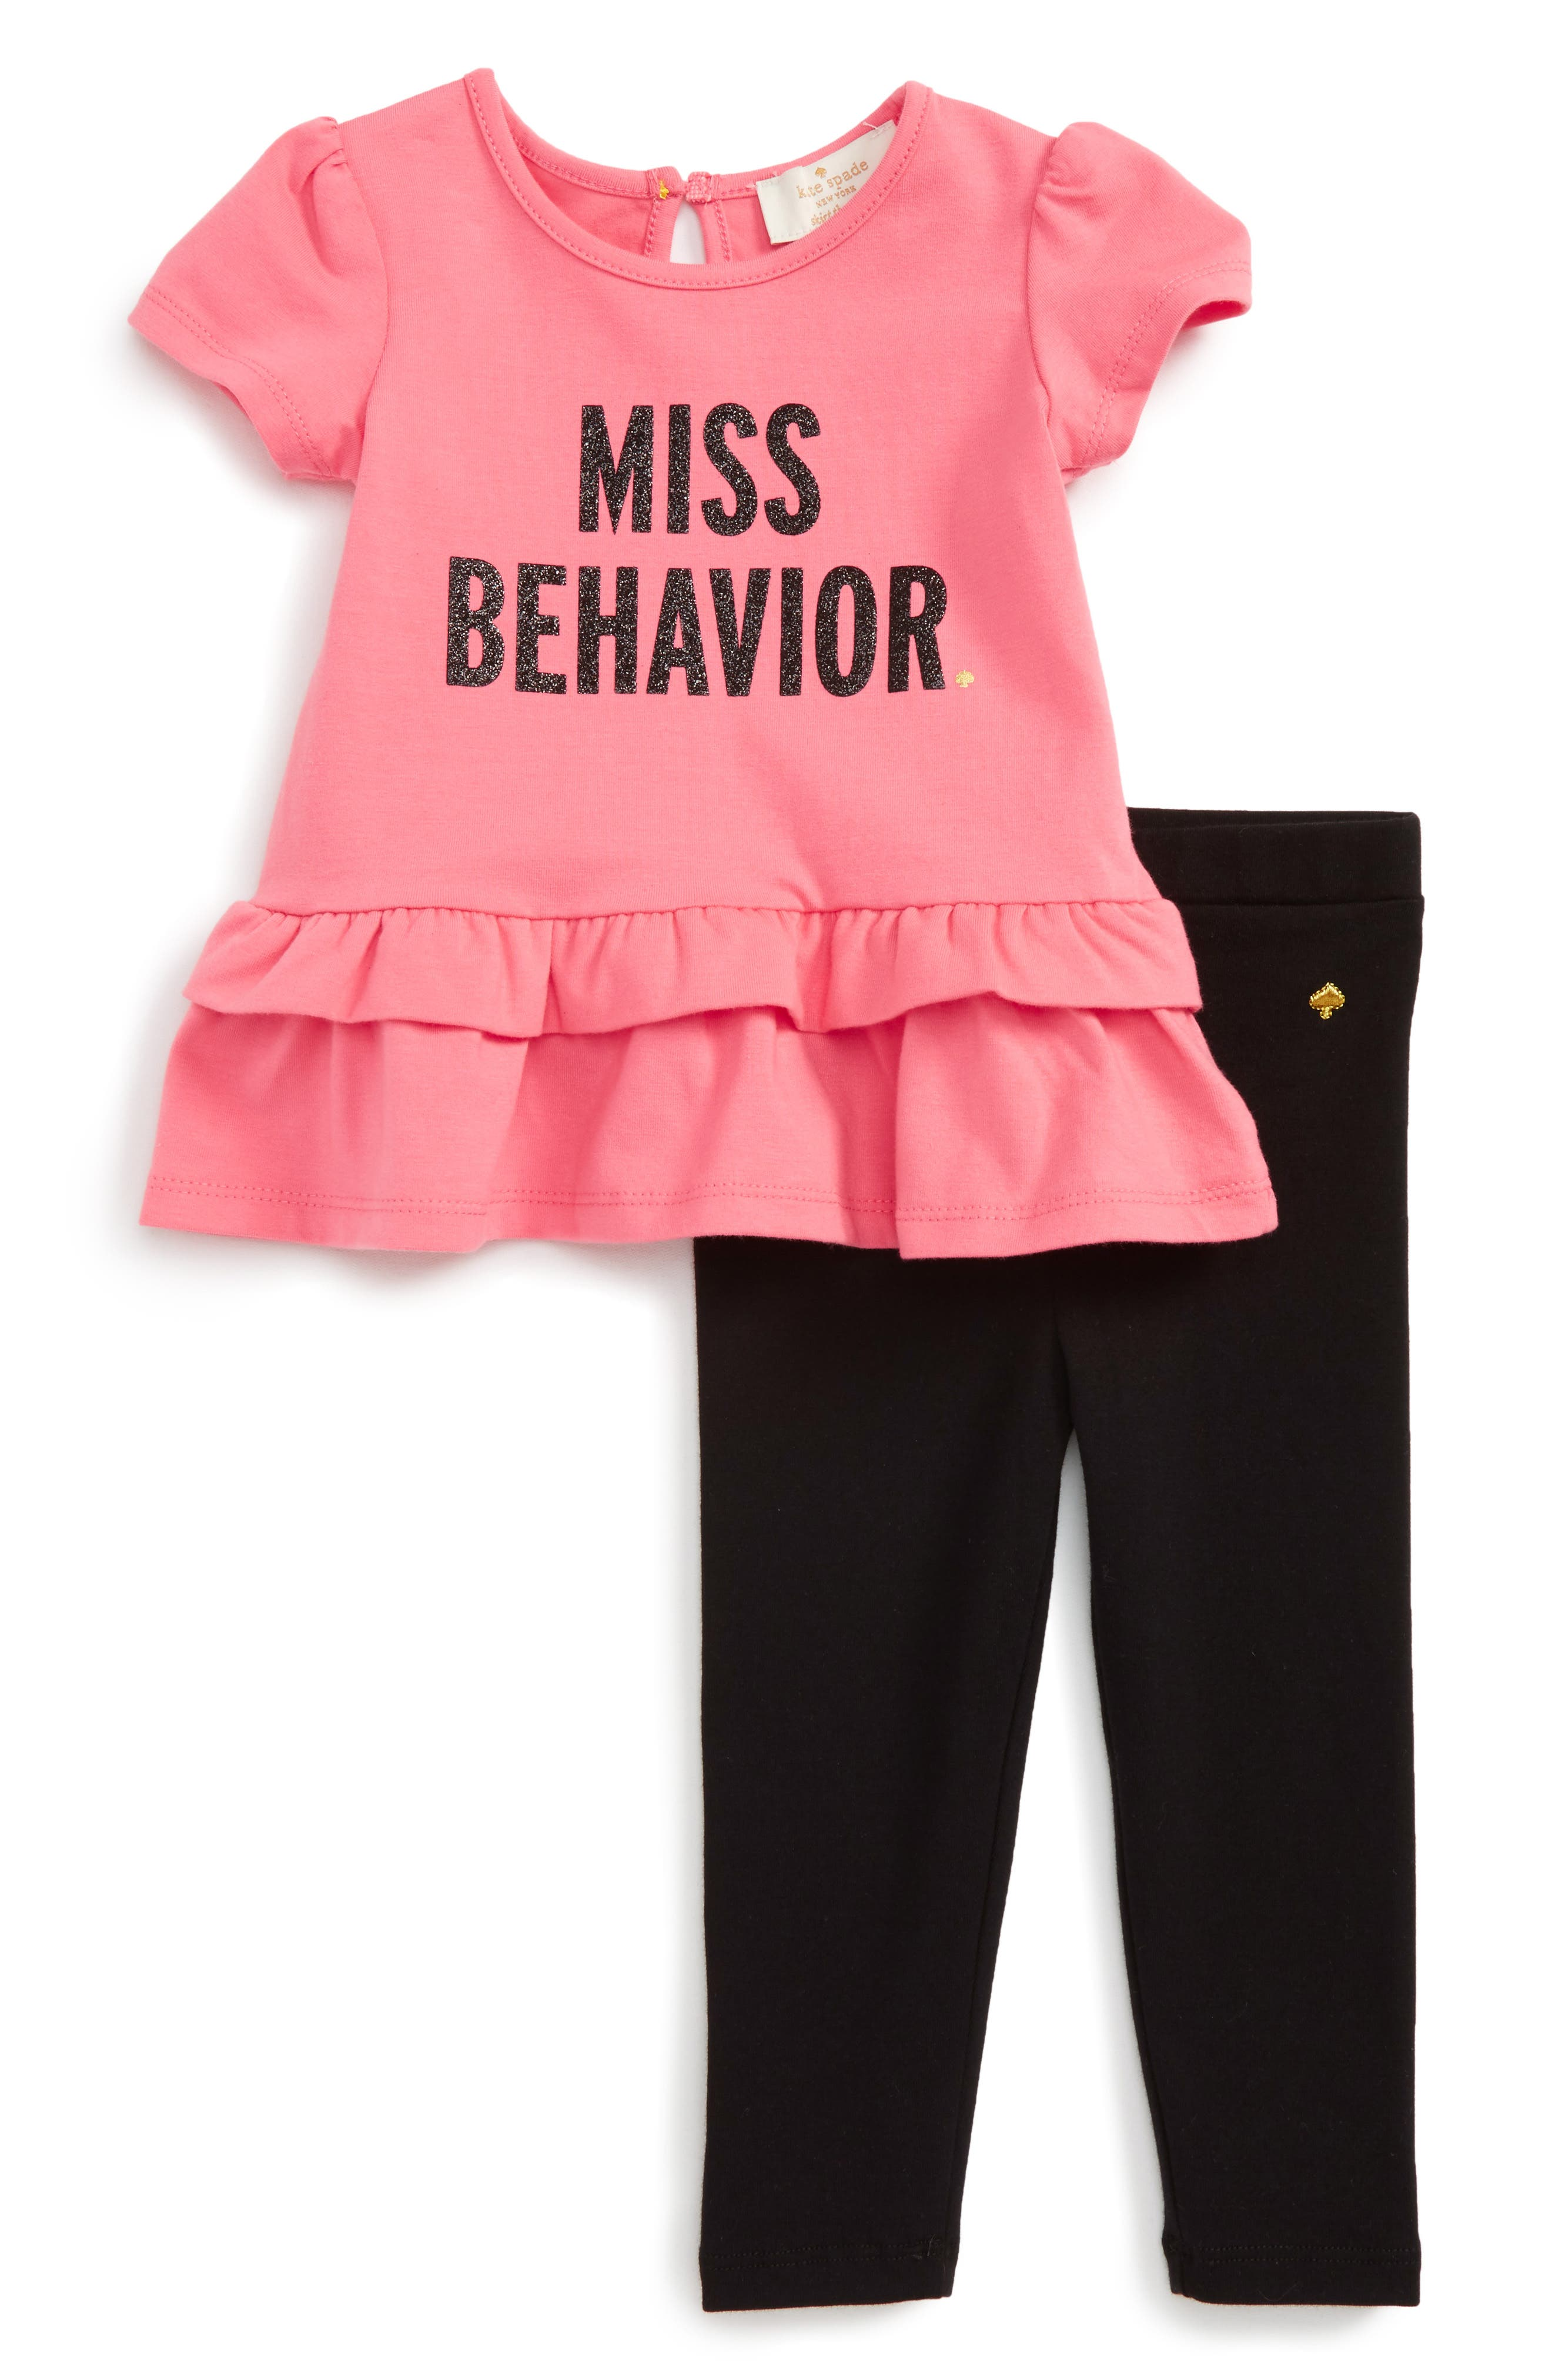 kate spade new york miss behavior tee & leggings set (Baby Girls)